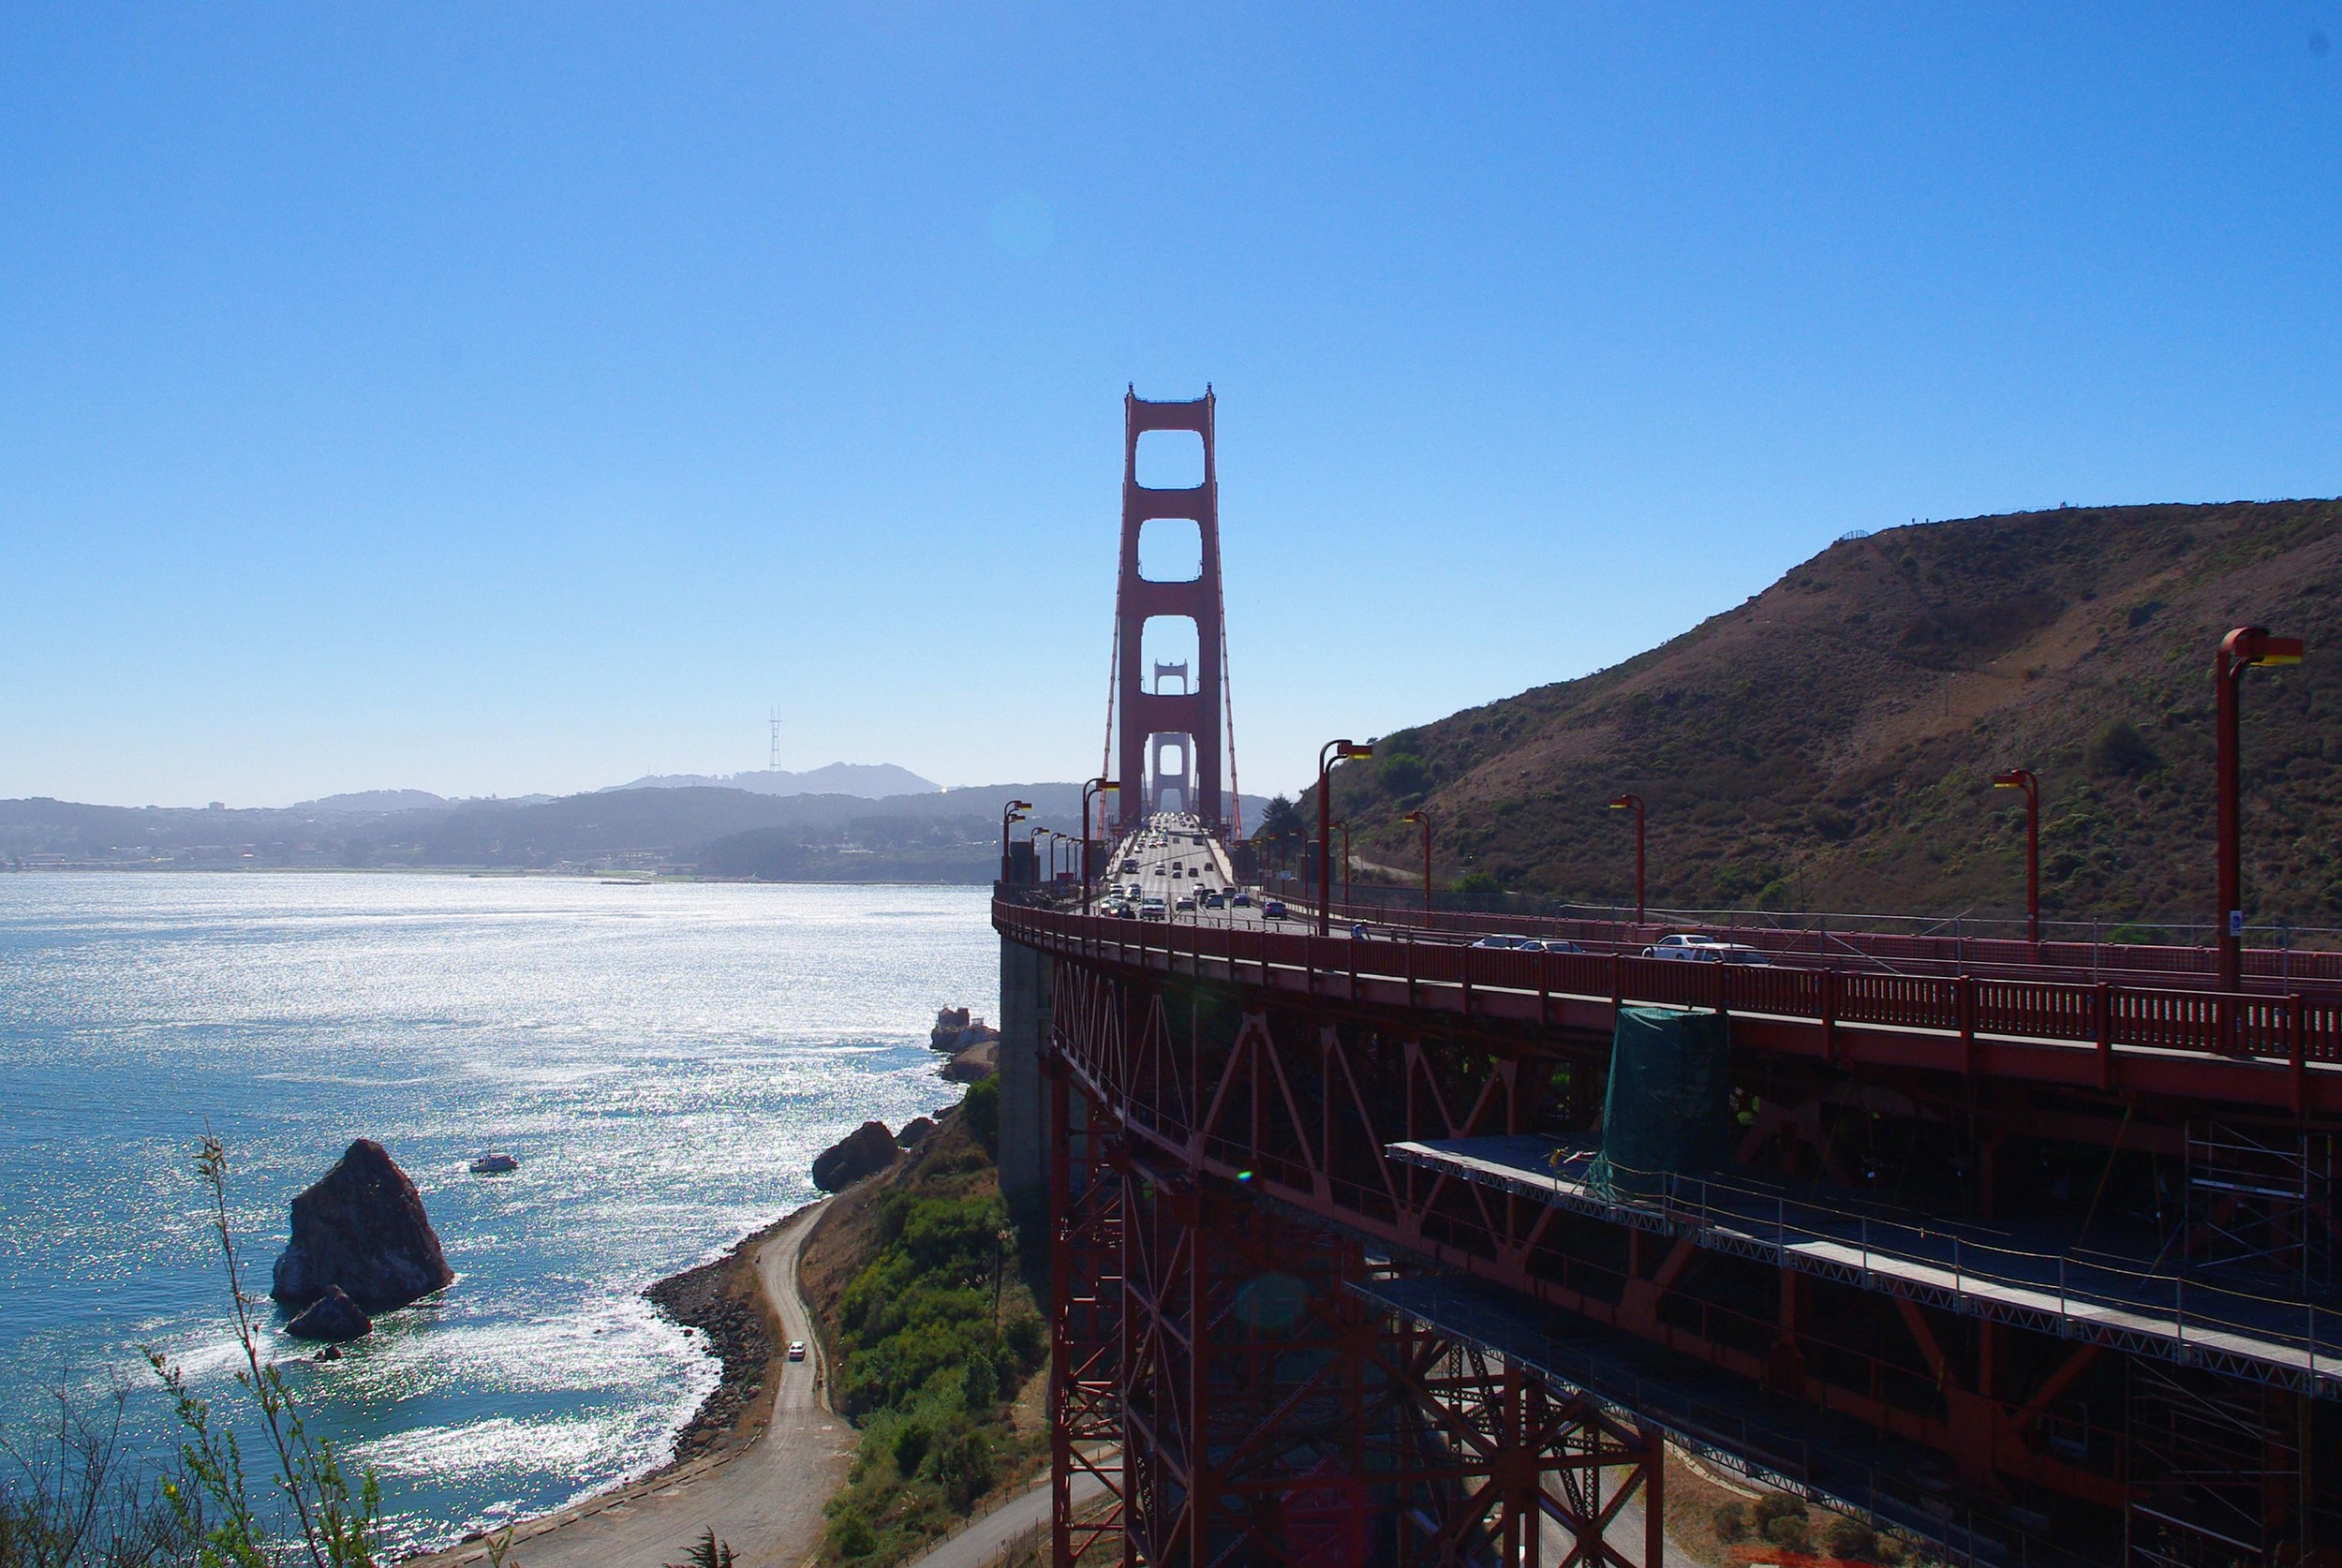 1.Walk across the Golden Gate Bridge